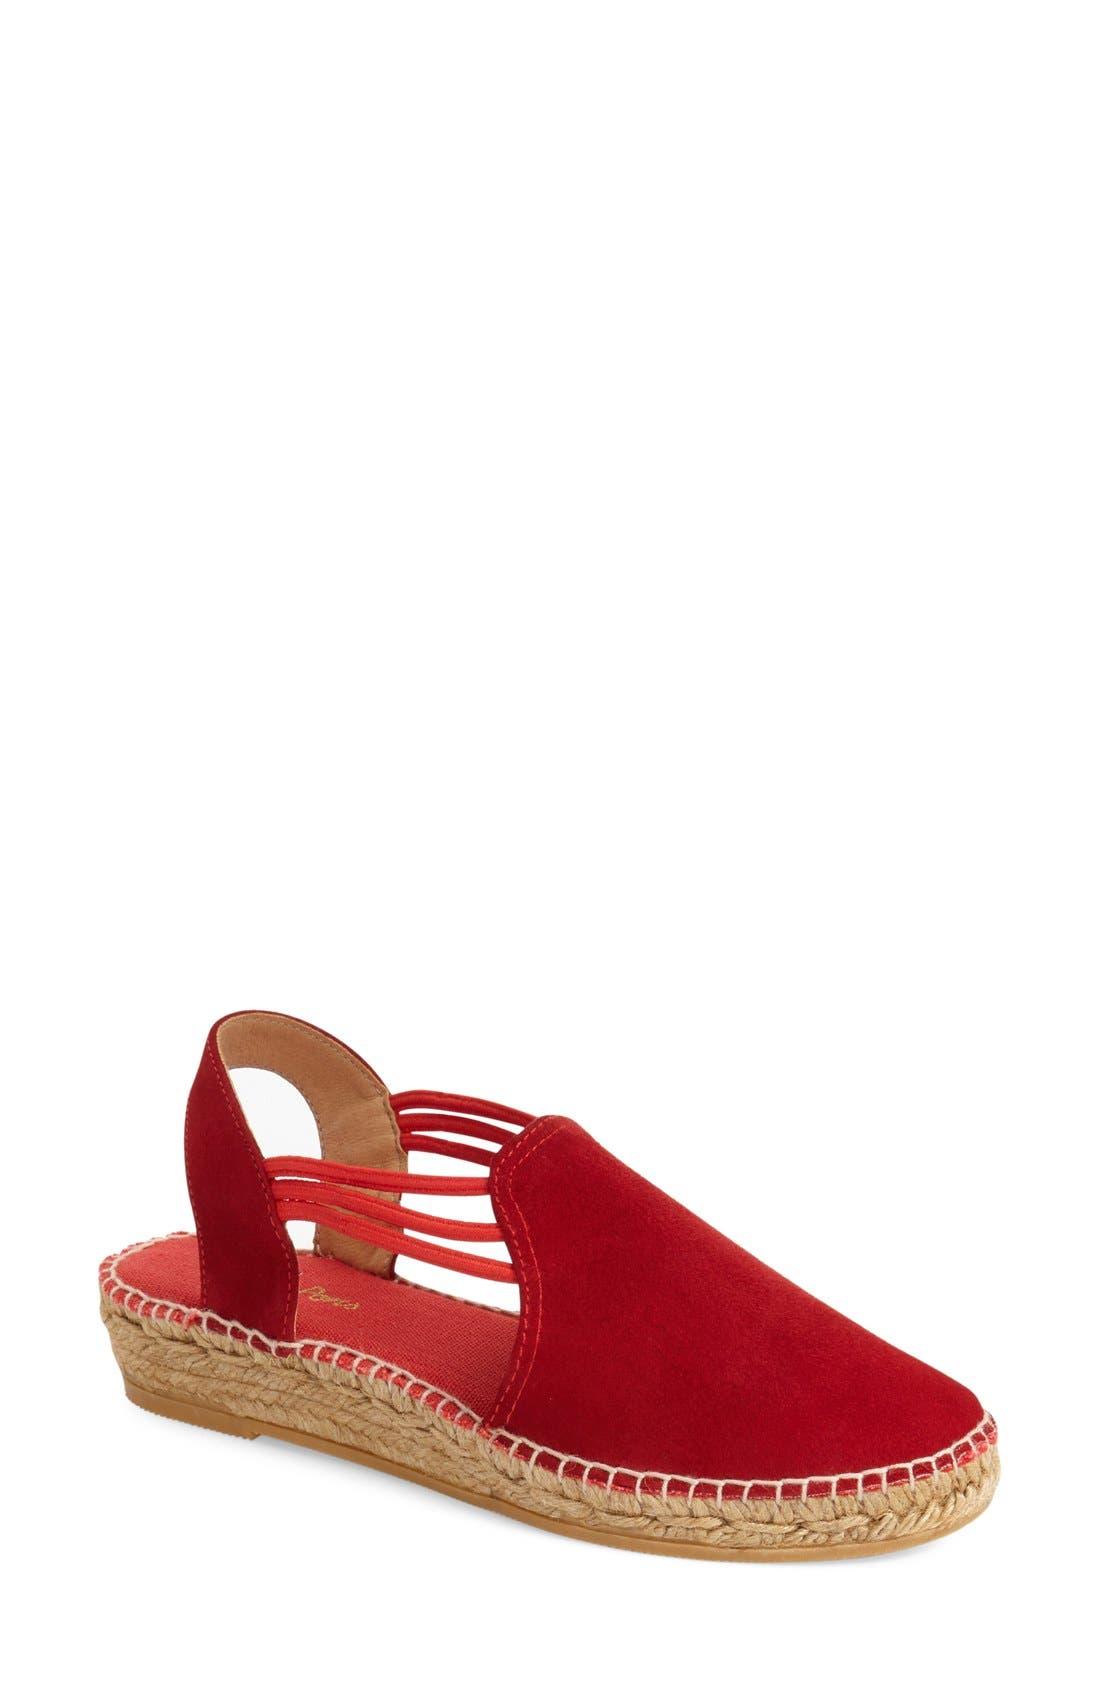 'Nuria' Suede Sandal,                         Main,                         color, 600